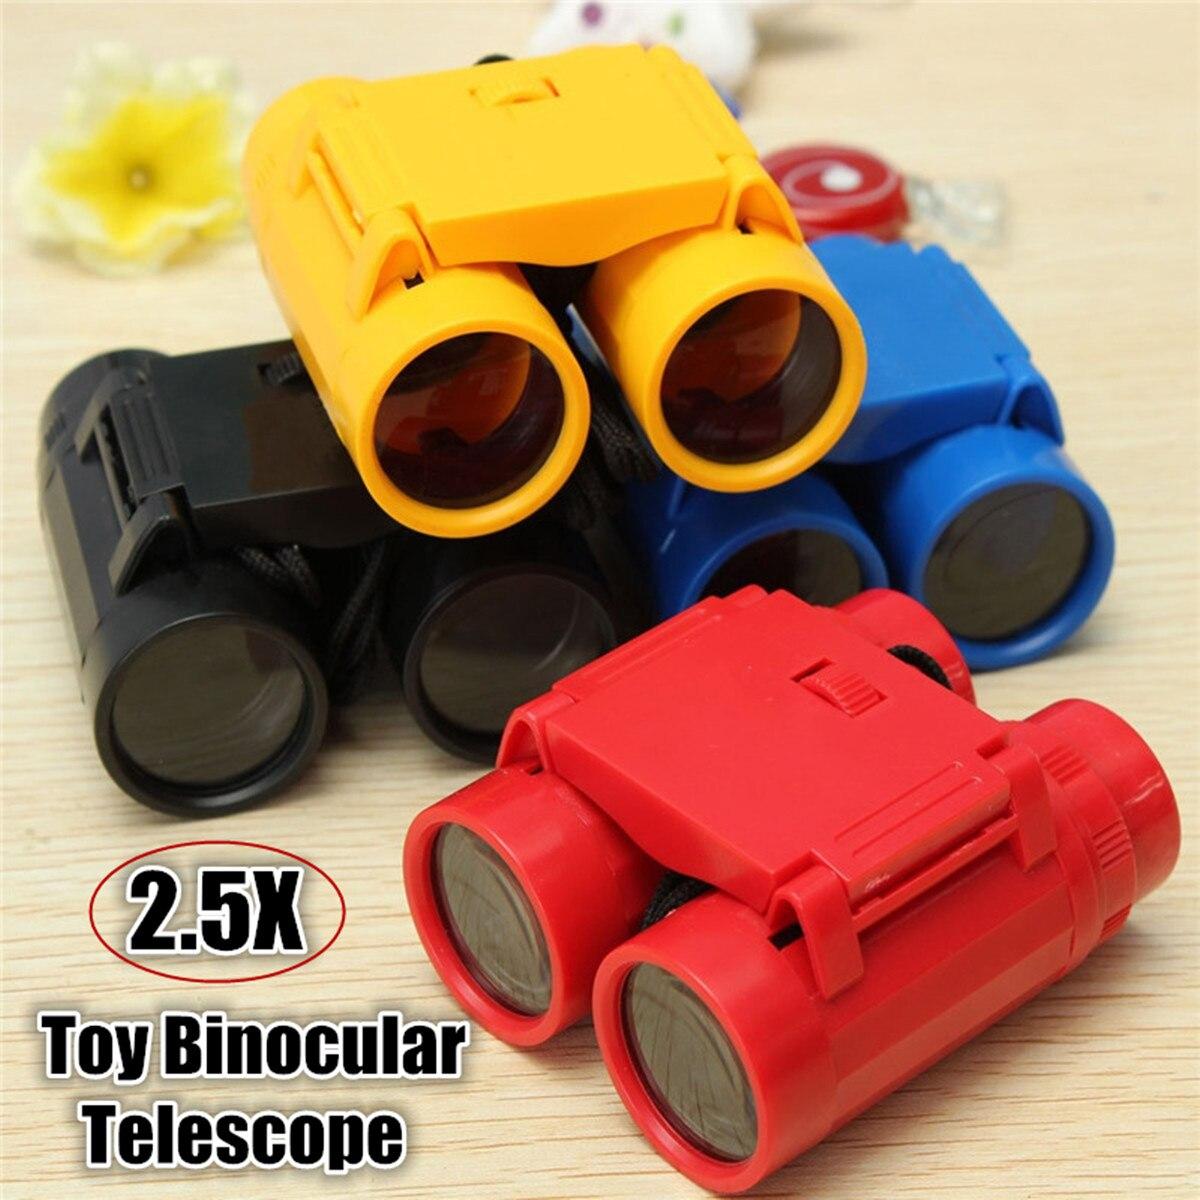 Folding Outdoor Mini Binoculars Telescope 3.9x2.7in 2.5X26 Scope Camouflage Toy Kids Boy Portable Children Gift Hunting Sports